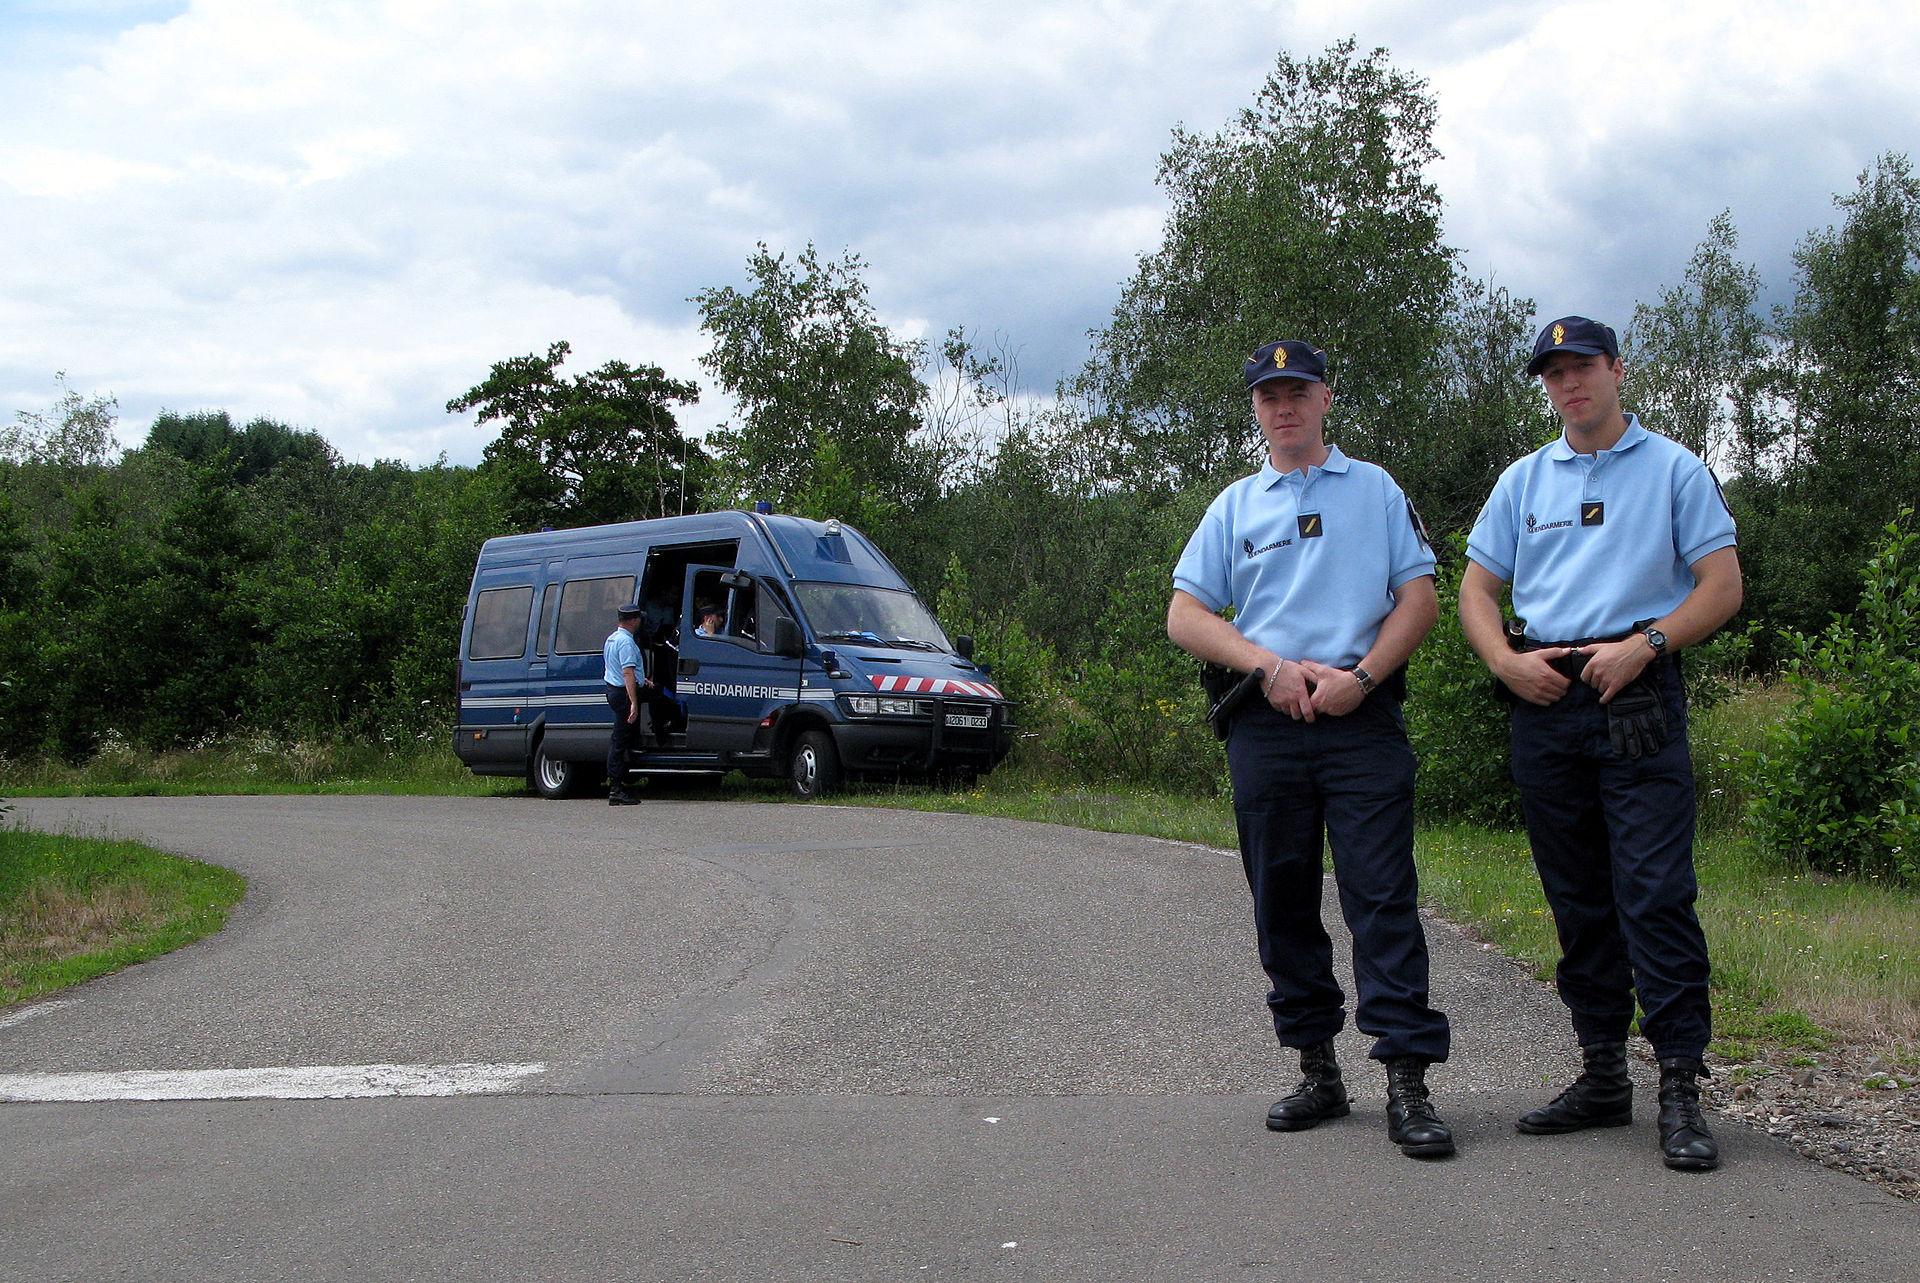 National gendarmerie wikipedia for Gendarmerie interieur